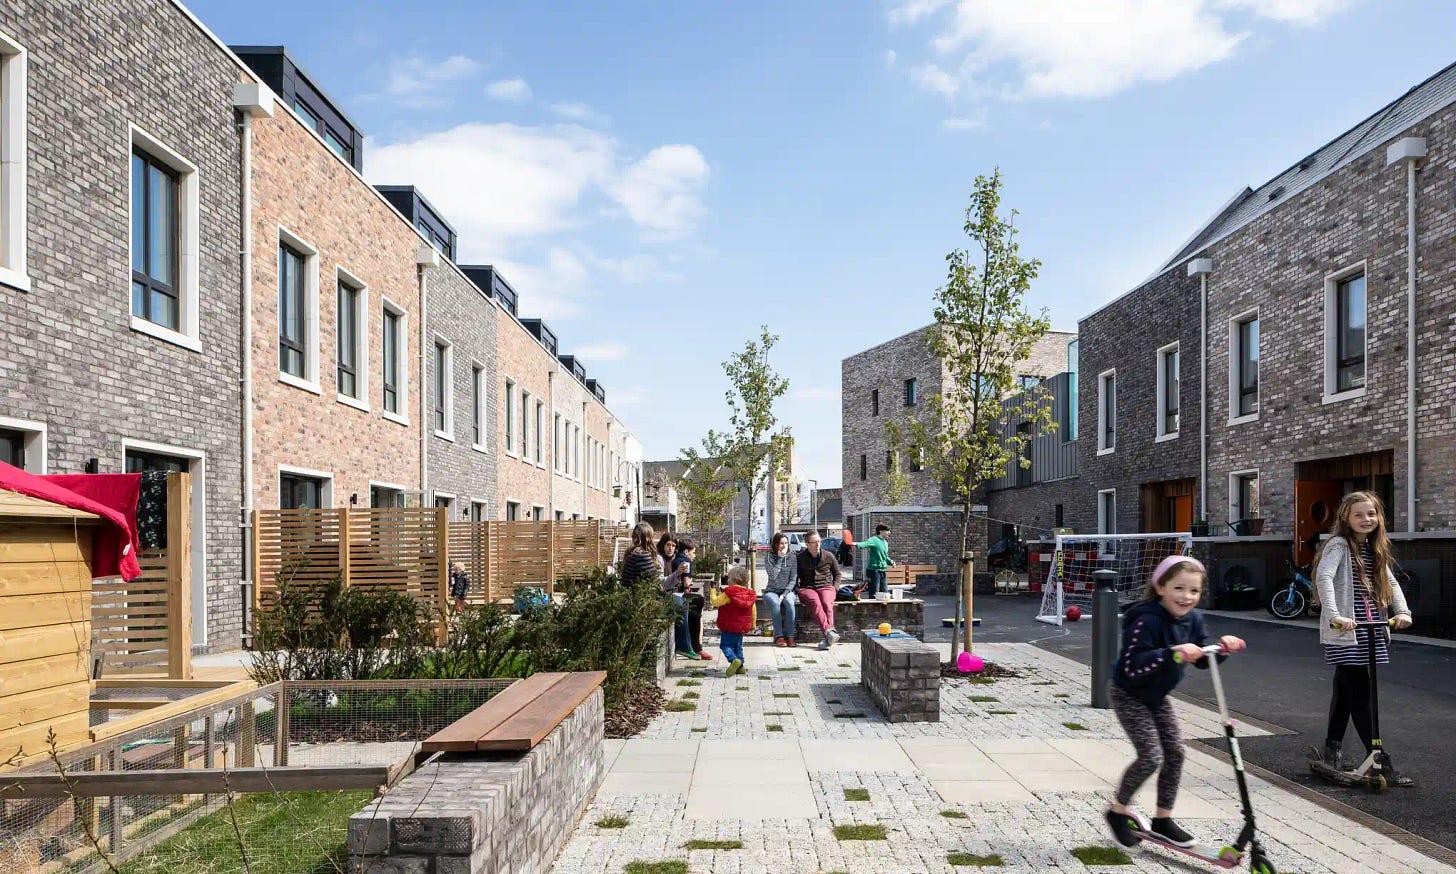 Traffic-Free Space at Marmalade Lane in Cambridge, UK (credit: David Butler/The Guardian)